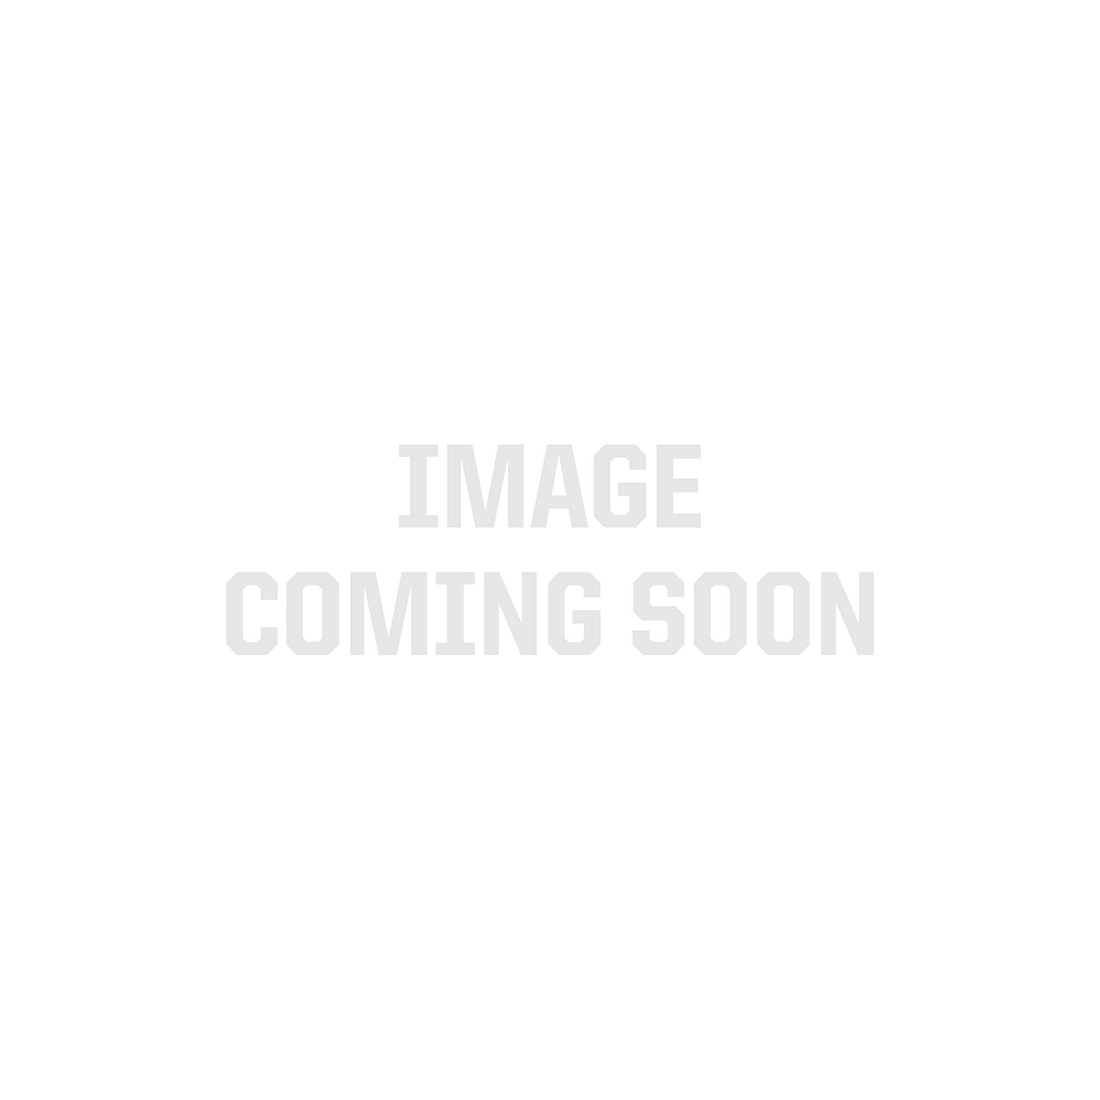 Waterproof Neutral White 3528 Single Row LED Strip Light, 120/m, 10mm wide, Sample Kit